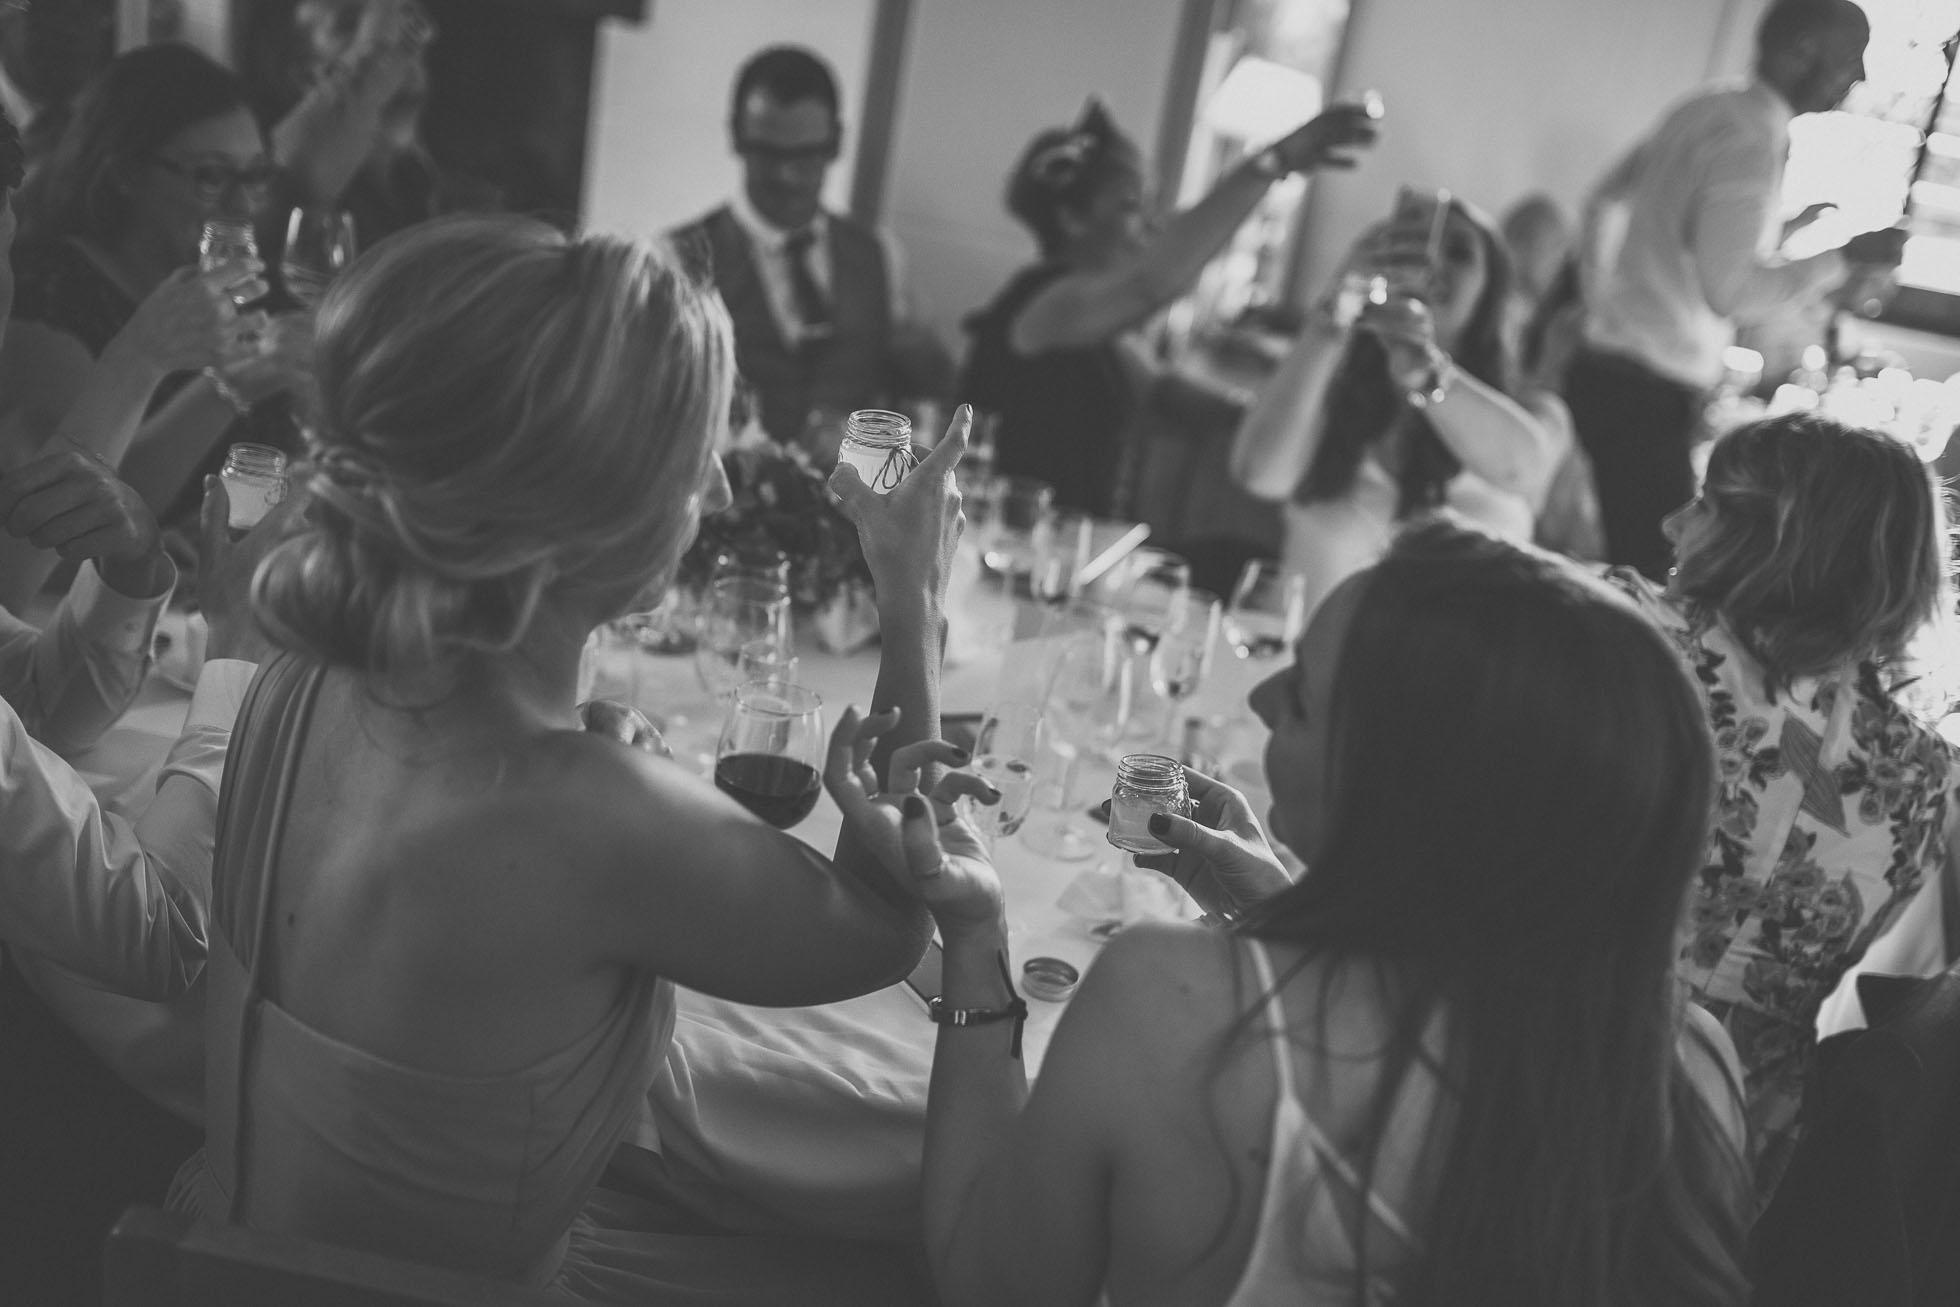 denton-hall-wedding-photographer-57.jpg